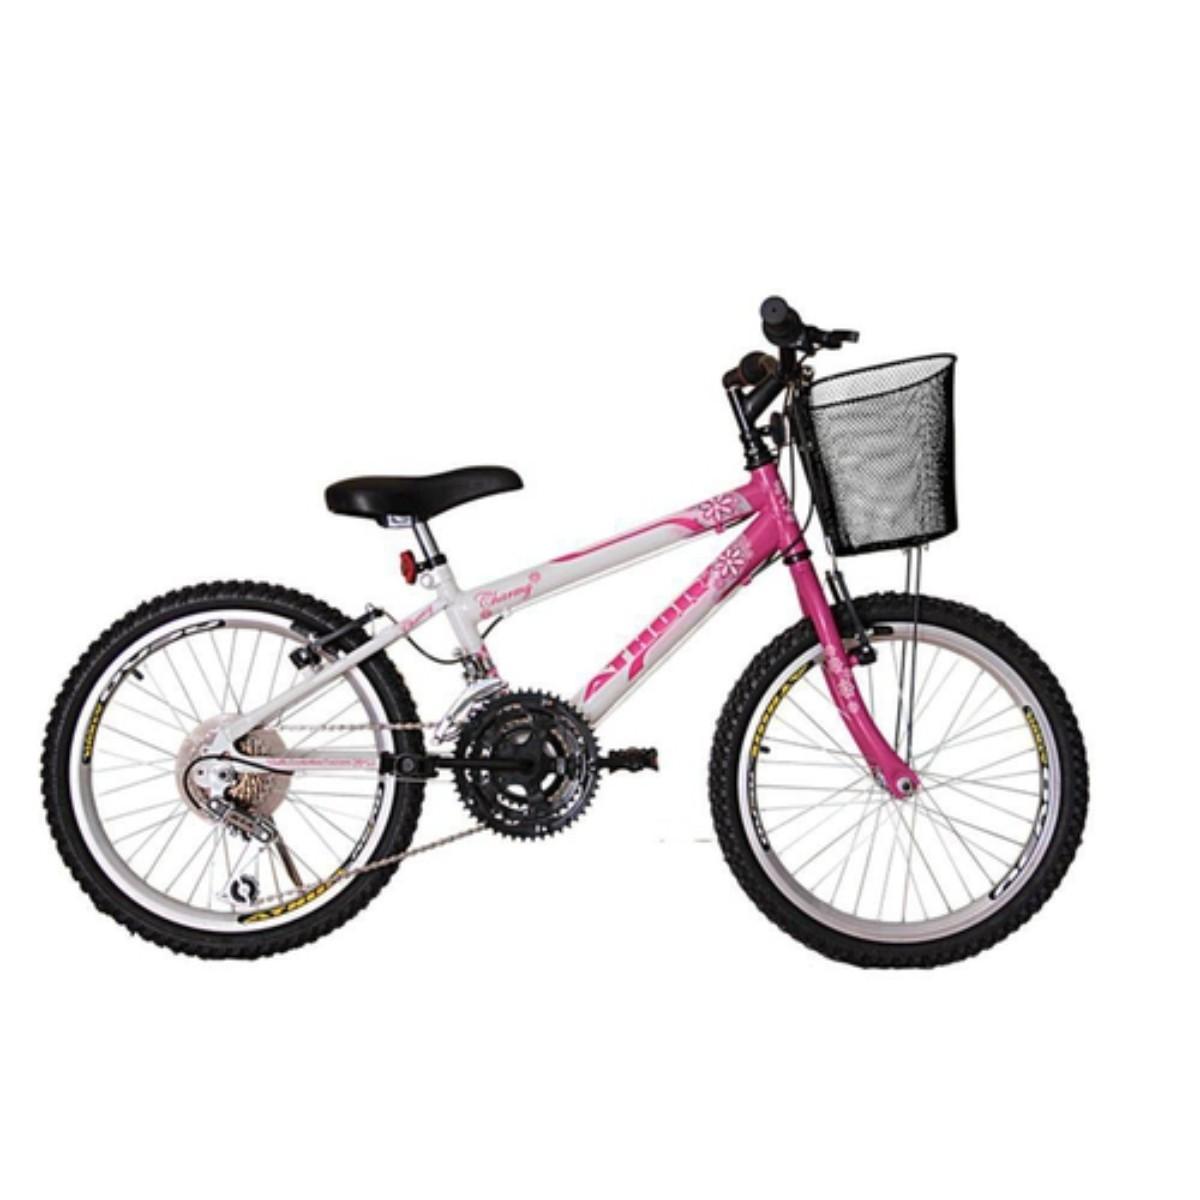 Bicicleta Athor Charmy Infantil Aro 20 18v C/ Cesto Feminina